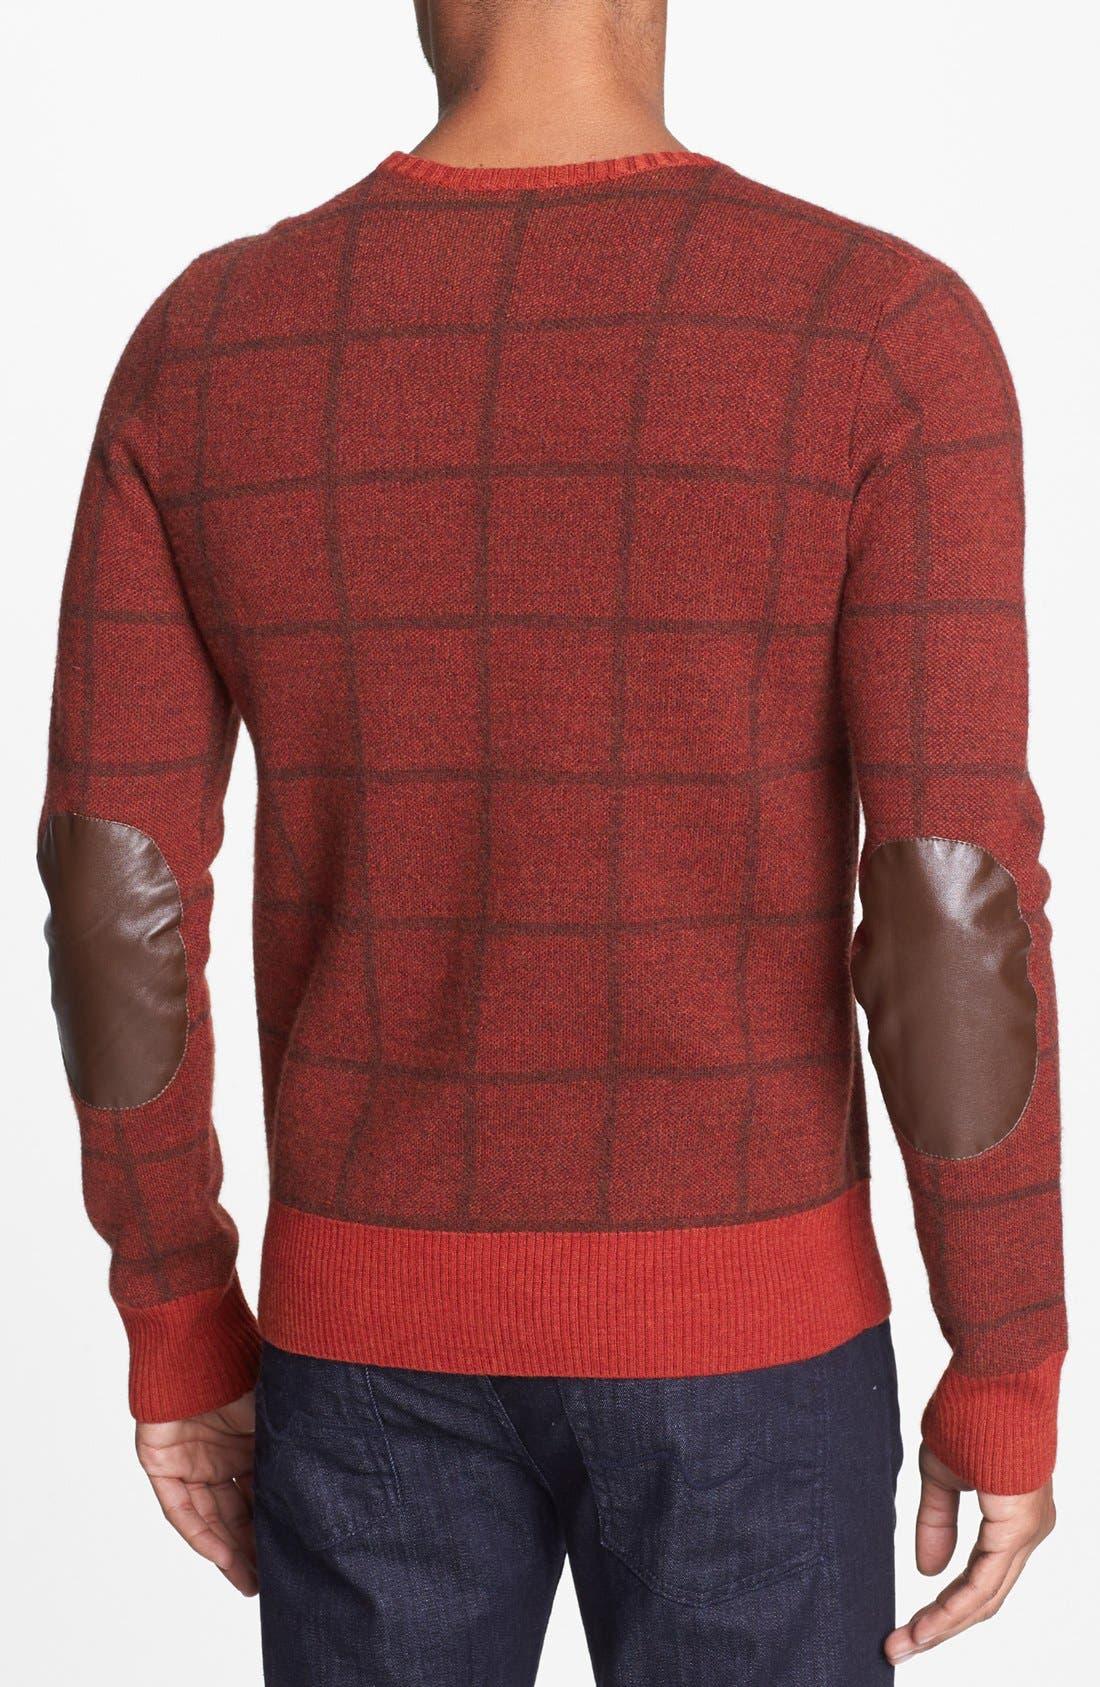 Alternate Image 2  - J. Press York Street Windowpane Merino Wool Crewneck Sweater